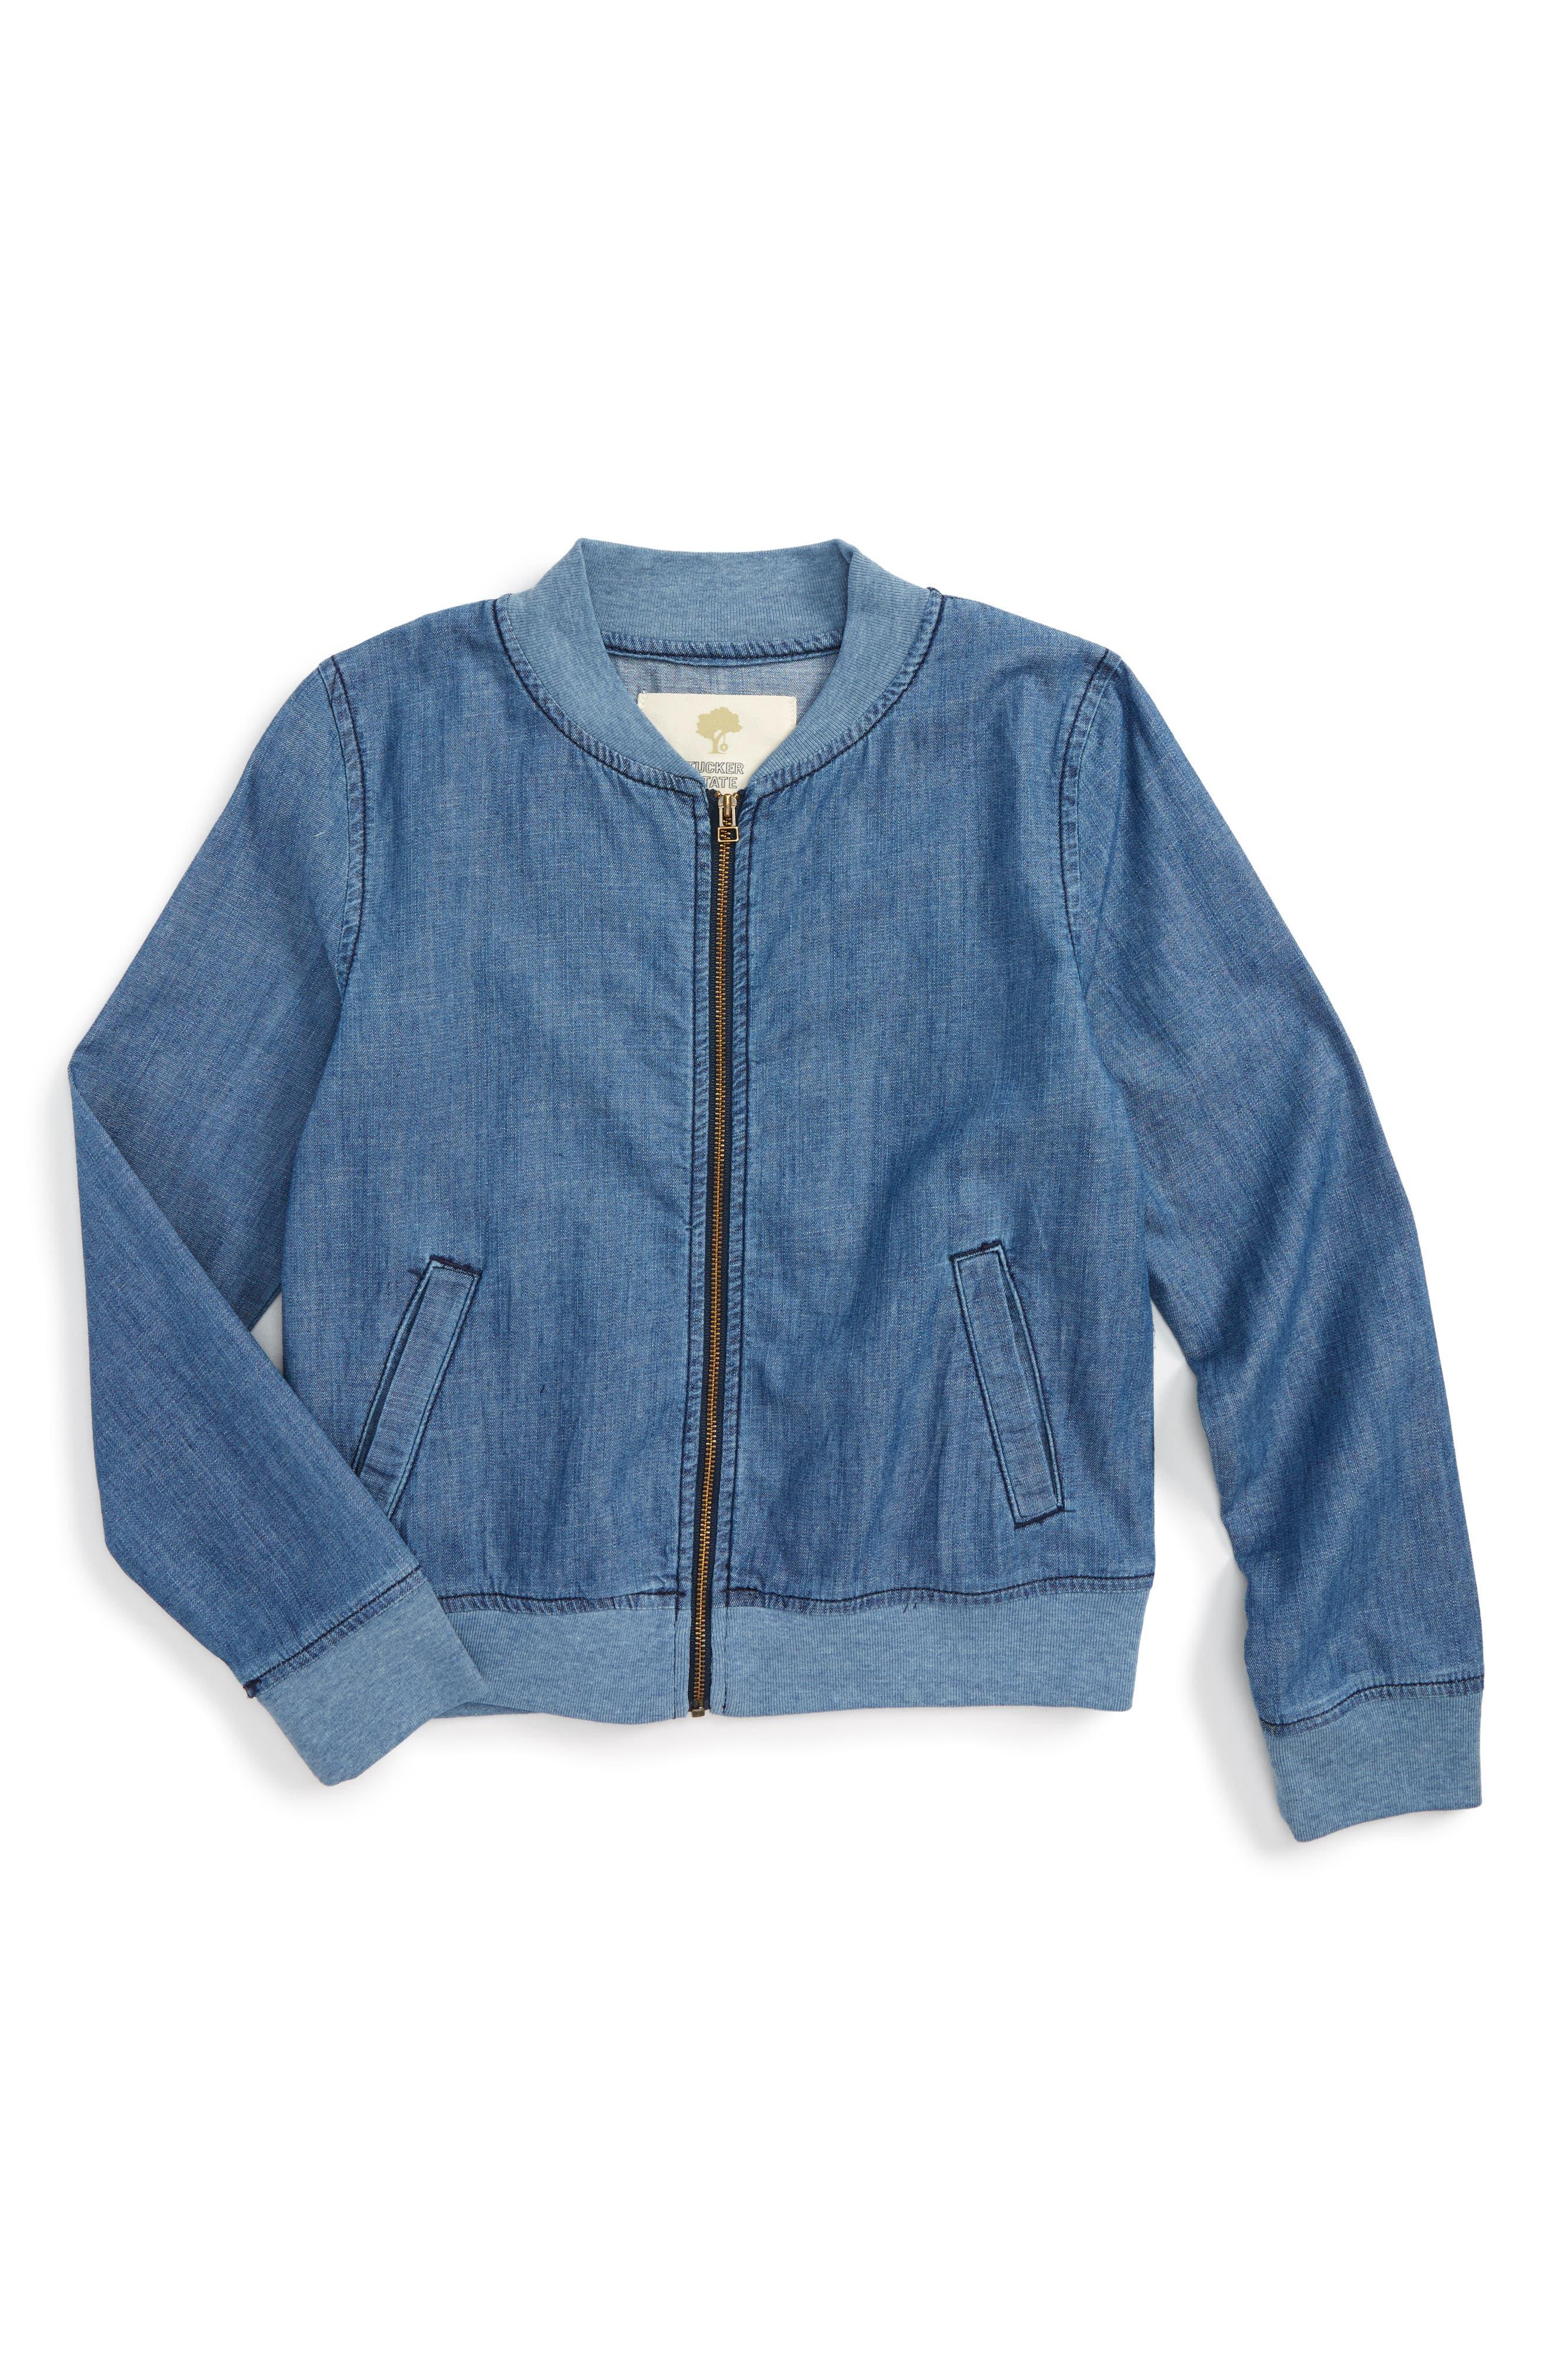 Denim Bomber Jacket,                             Main thumbnail 1, color,                             Dusk Blue Wash